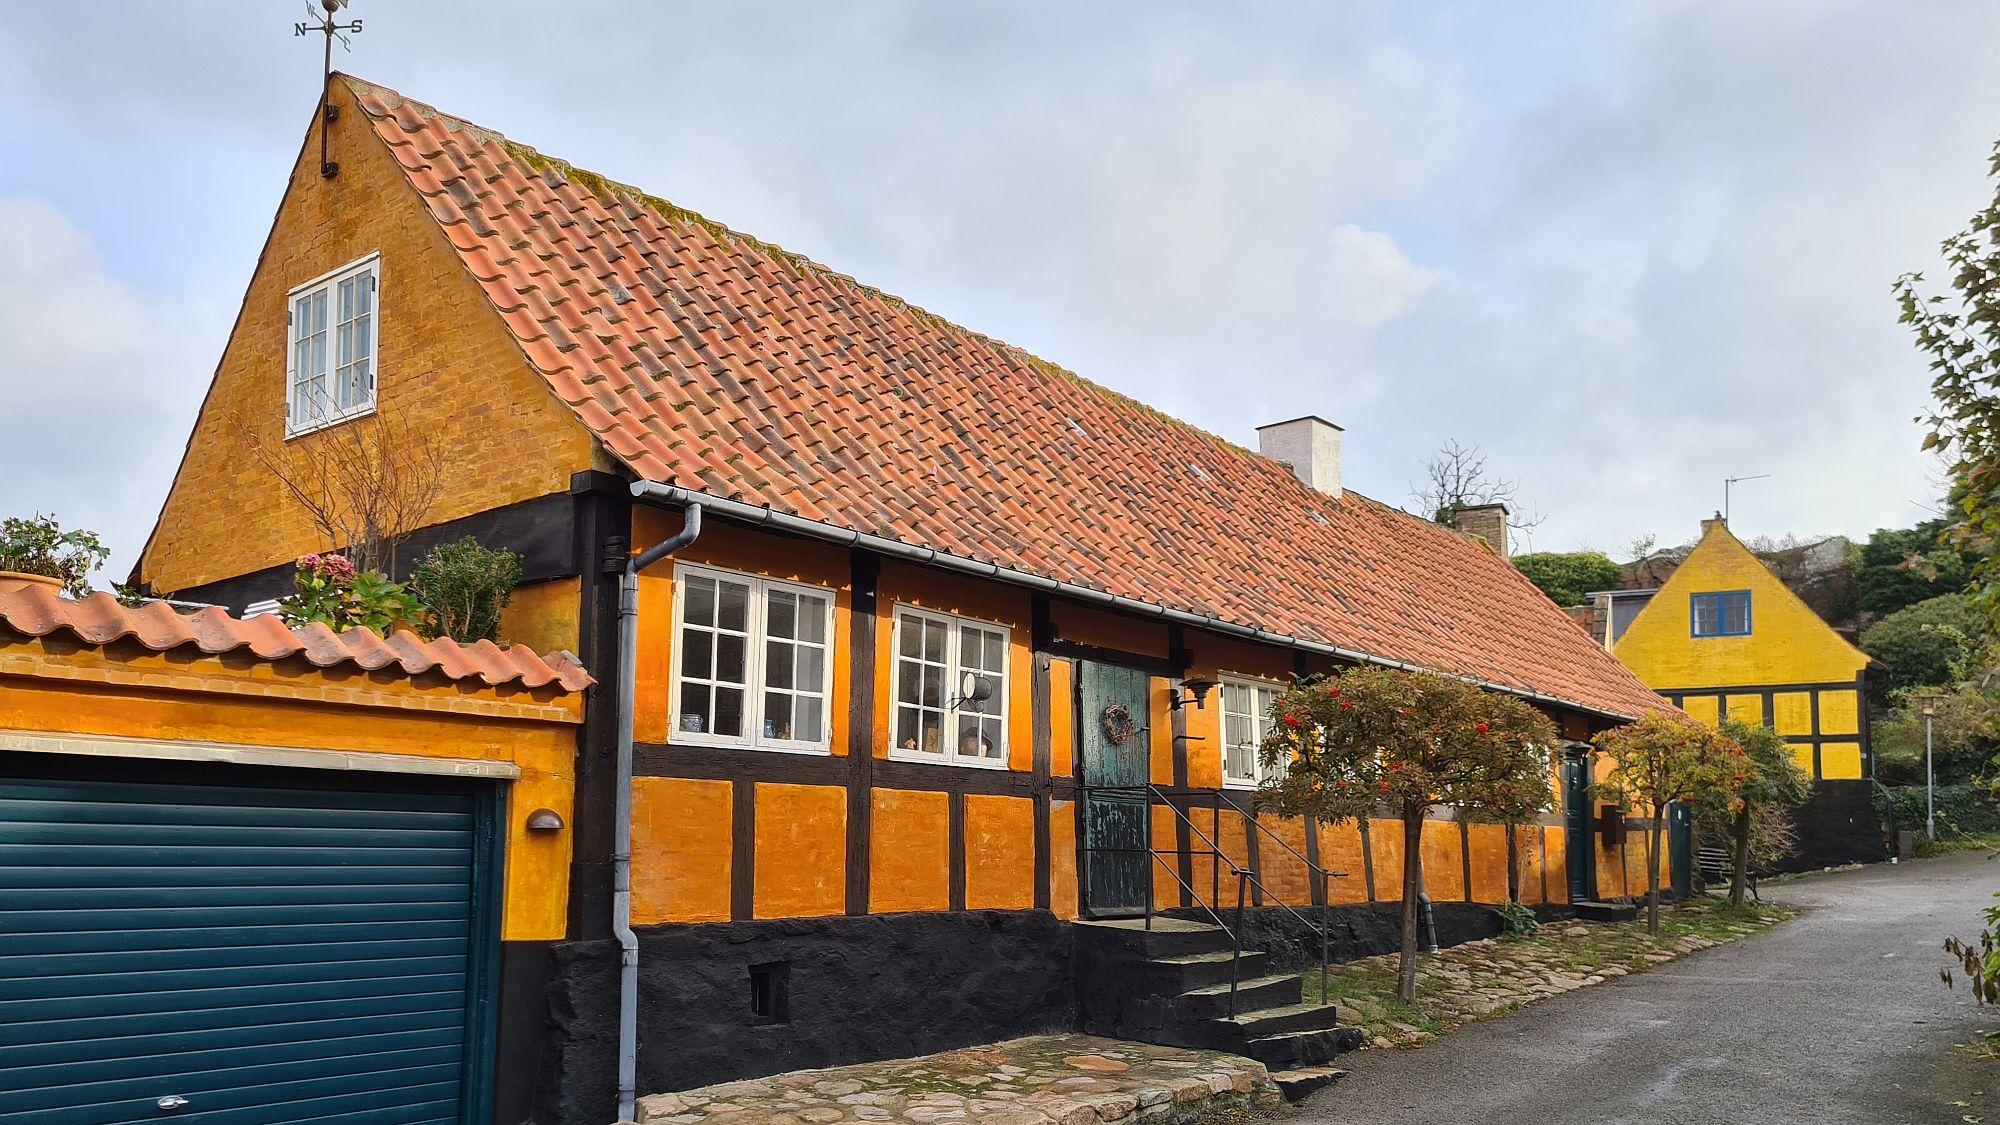 Gudhjem auf Bornholm